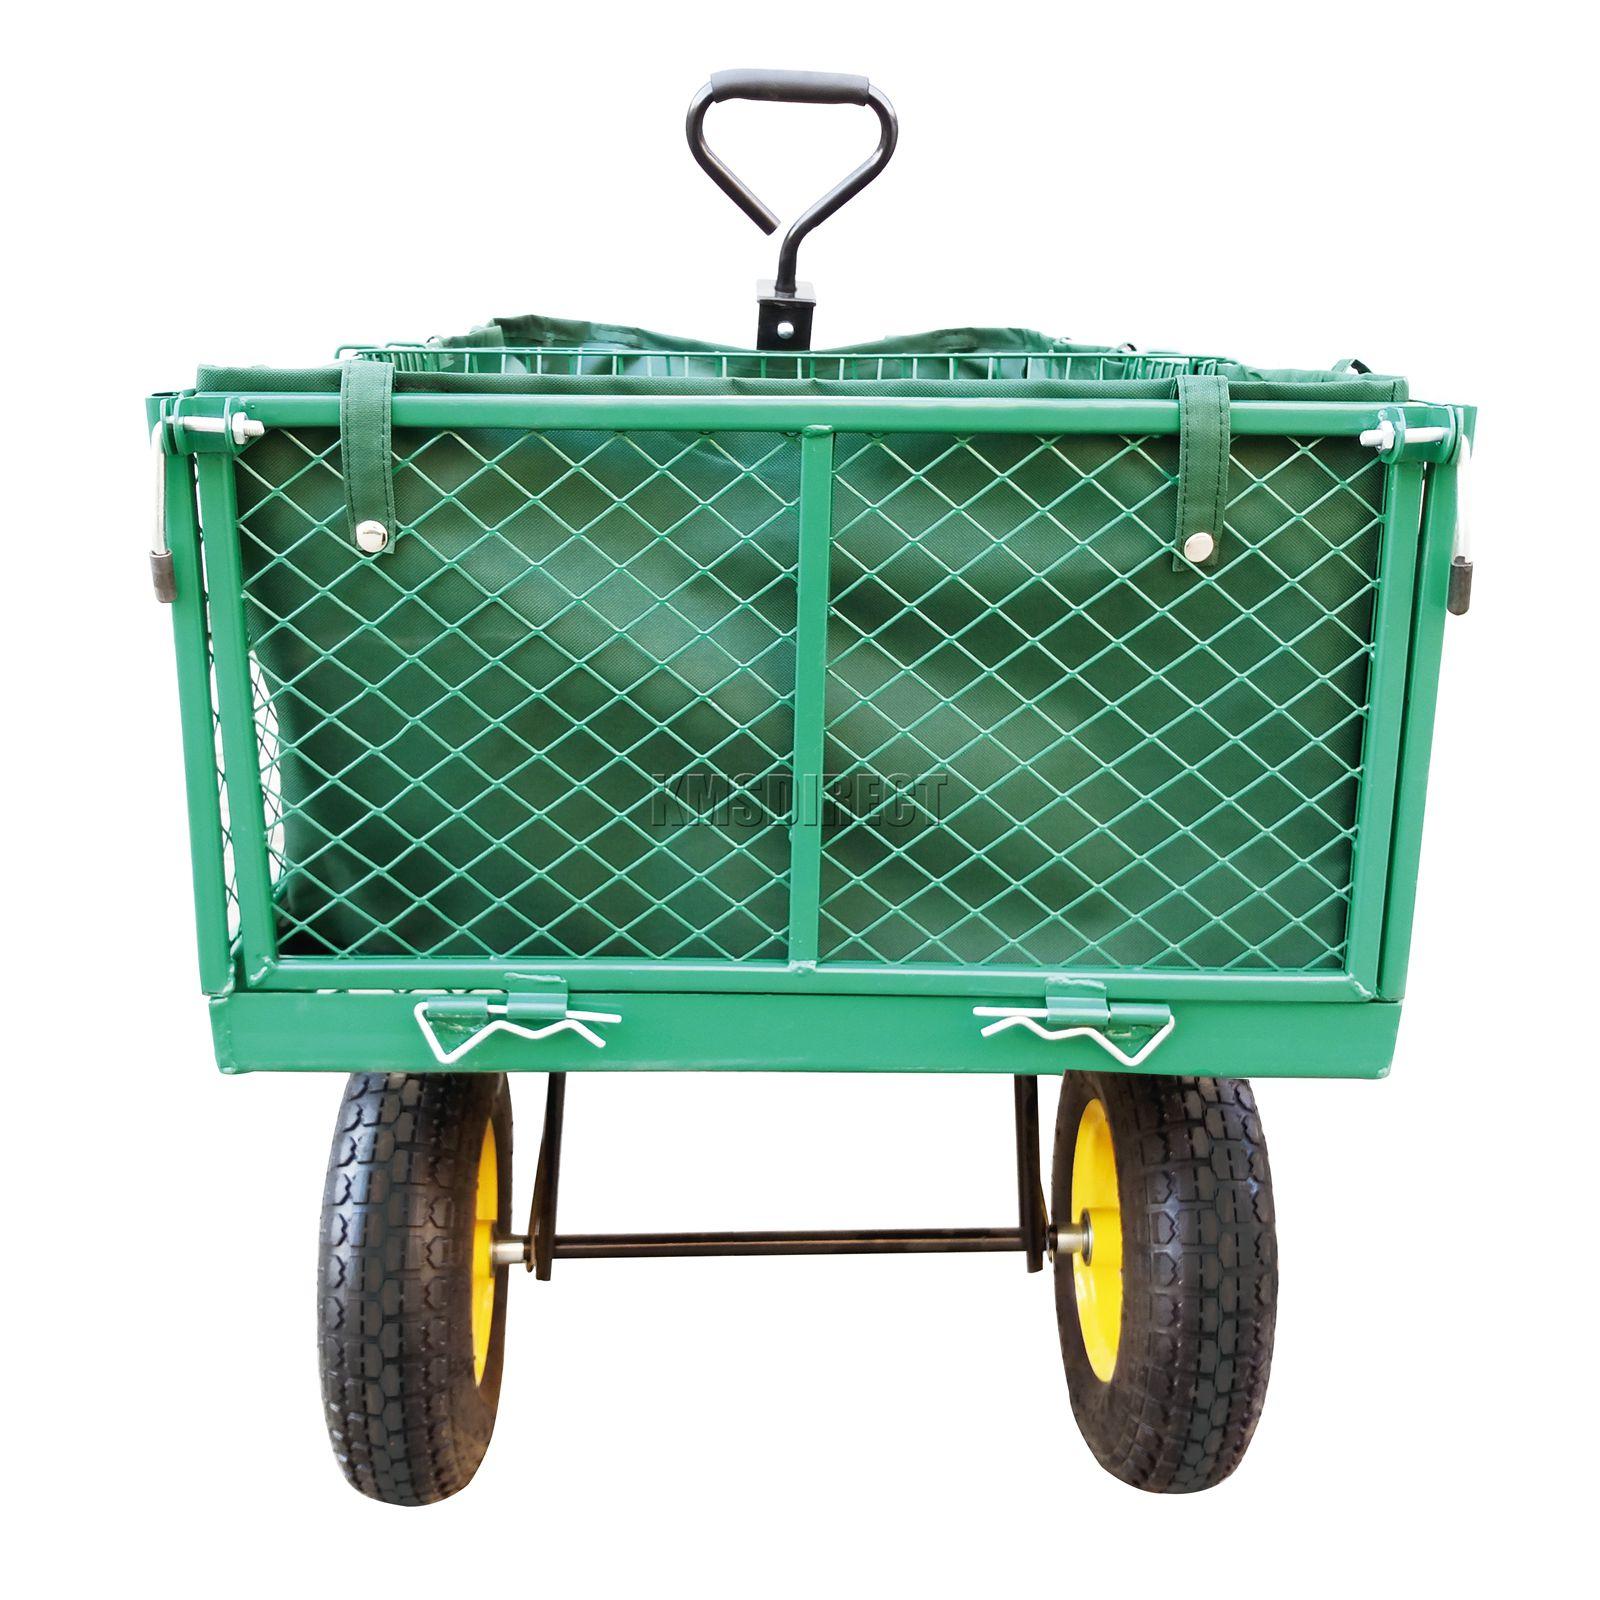 FoxHunter-Heavy-Duty-Garden-Dump-Truck-Tipping-Trailer-Trolley-Cart-Wheelbarrow miniatuur 25